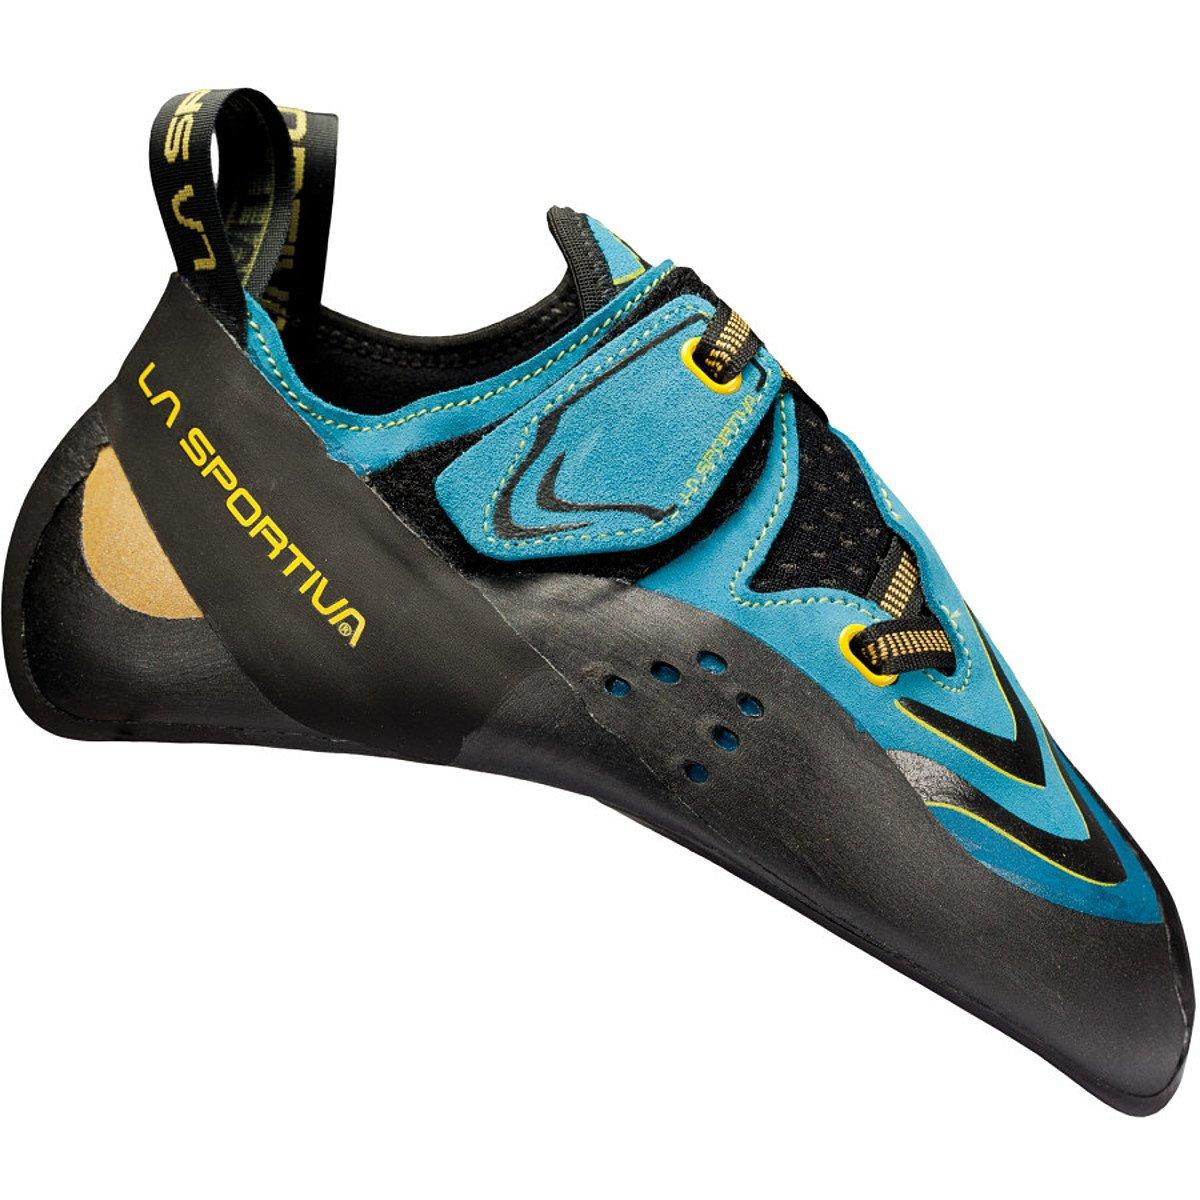 [La Sportiva] メンズ Futura Rock Climbing Shoe - Men's B005DLRJ32 40|ブルー ブルー 40